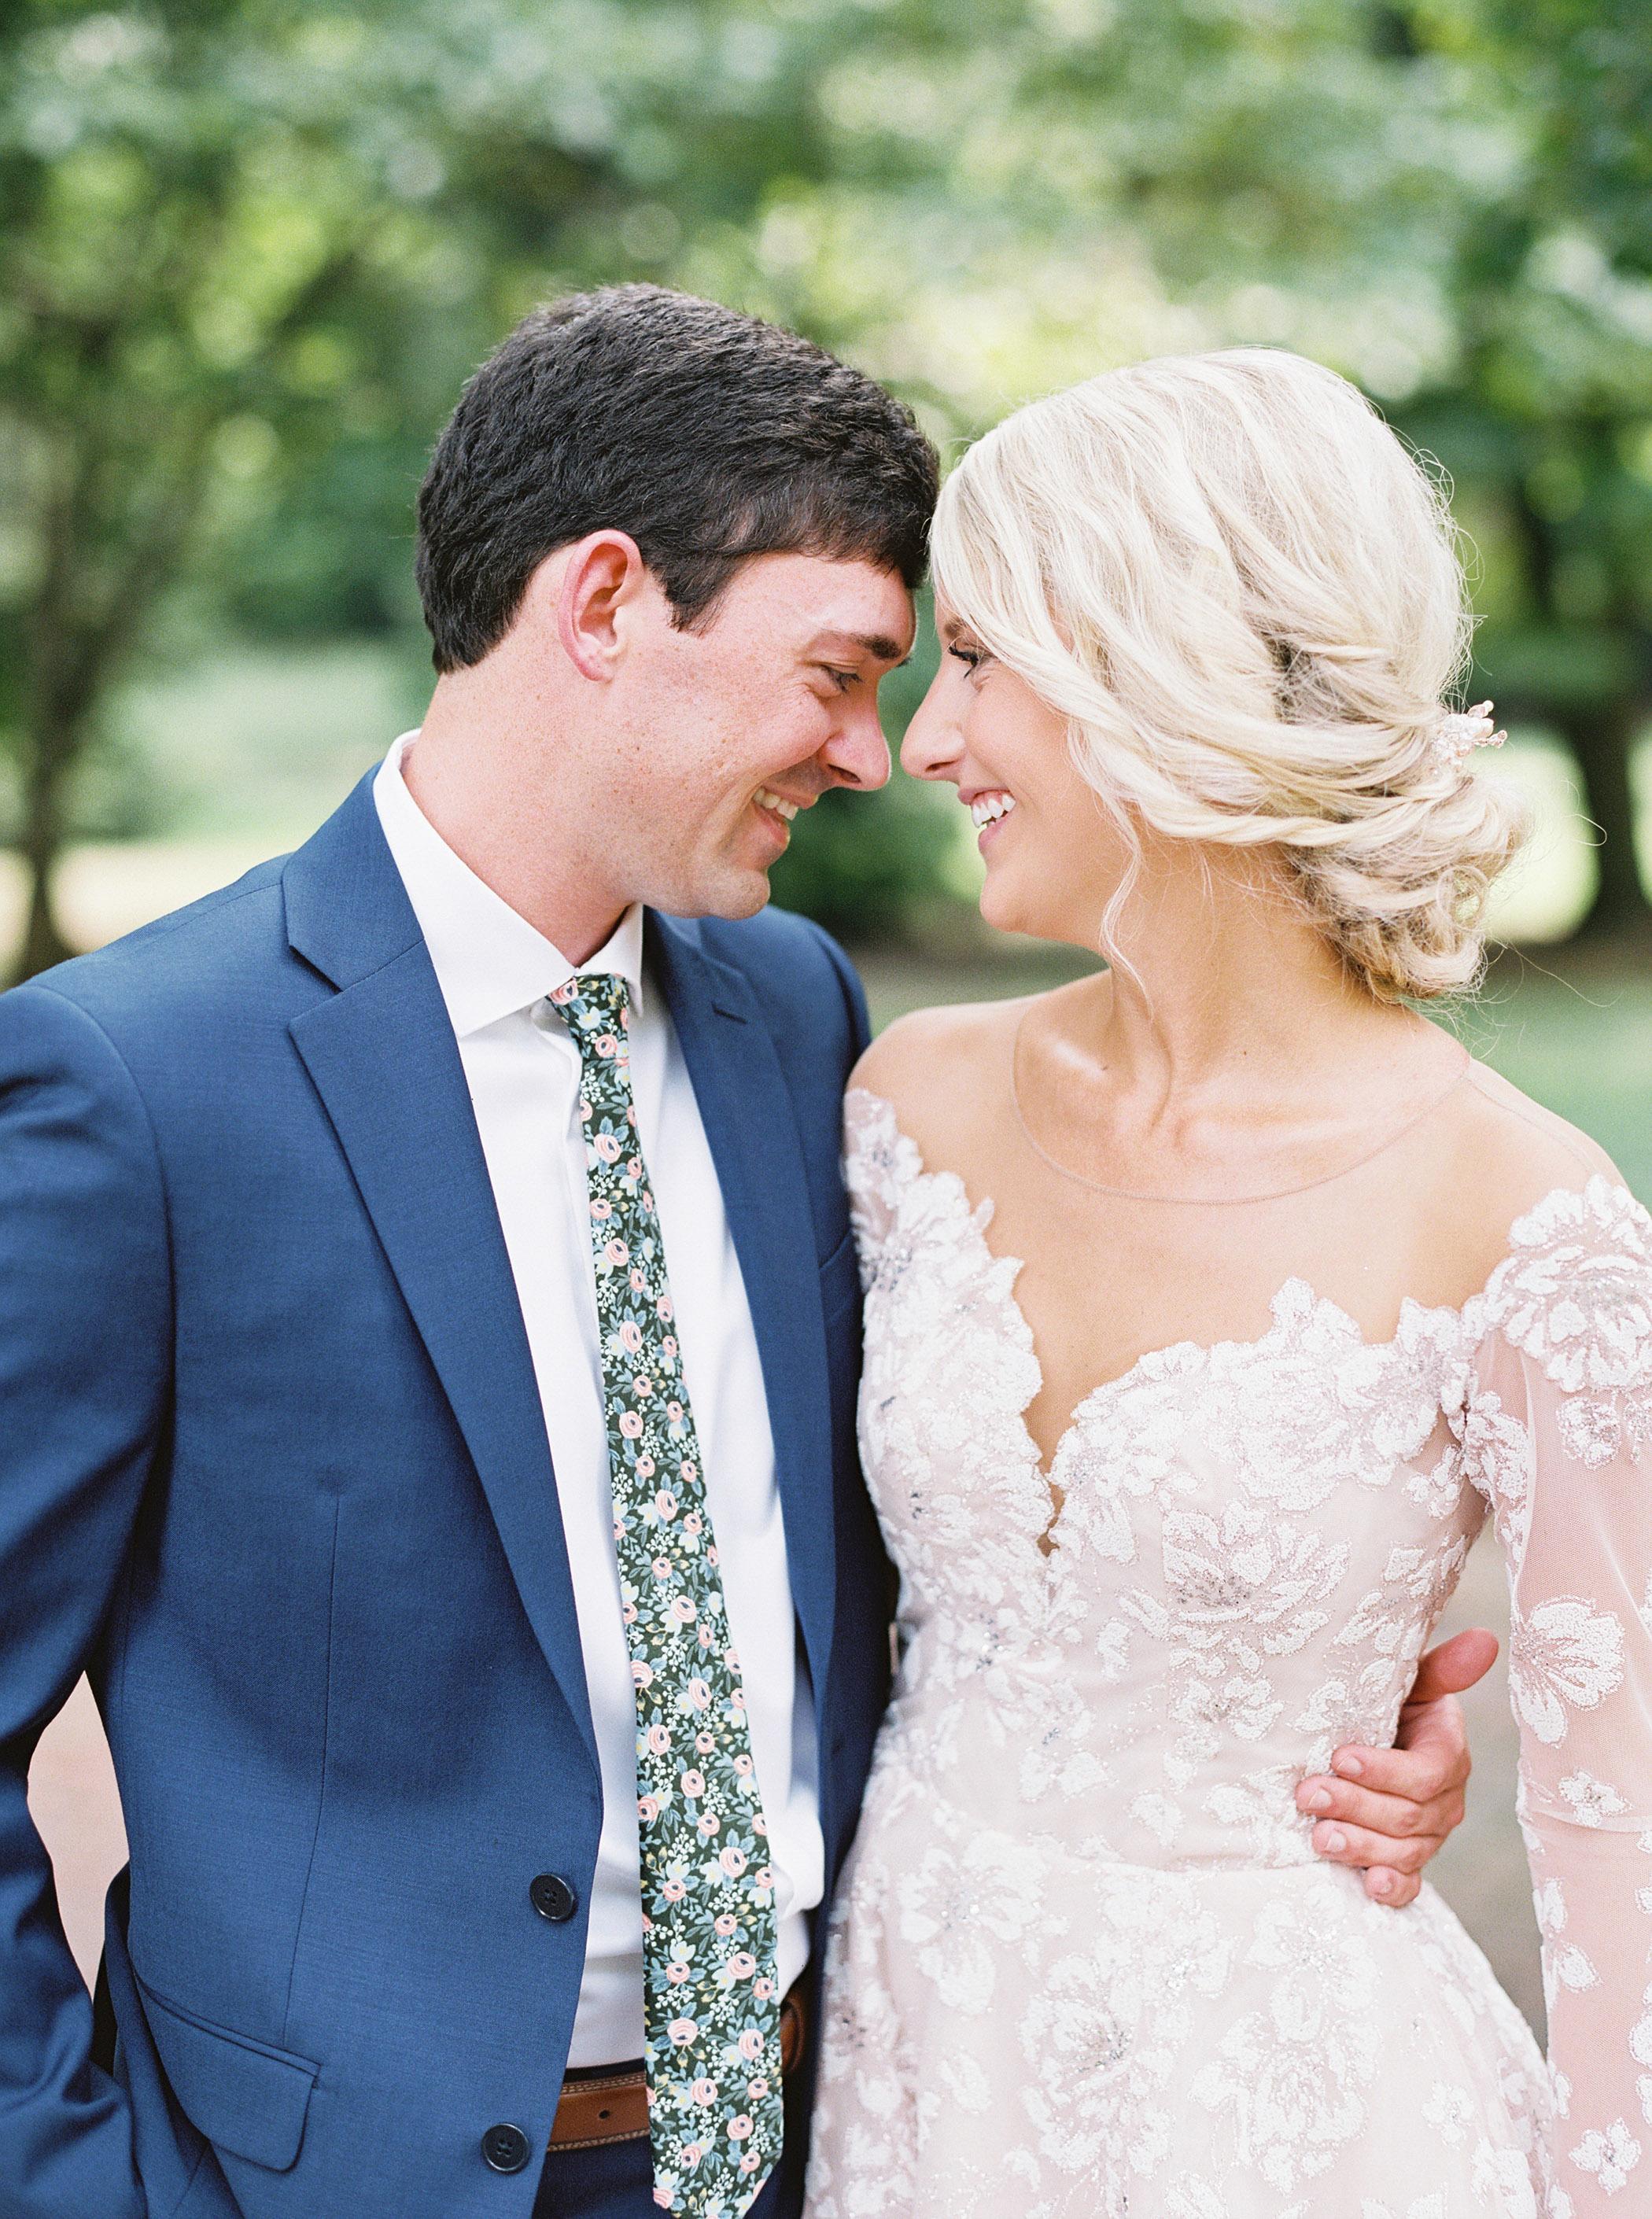 shelby preston wedding couple embracing